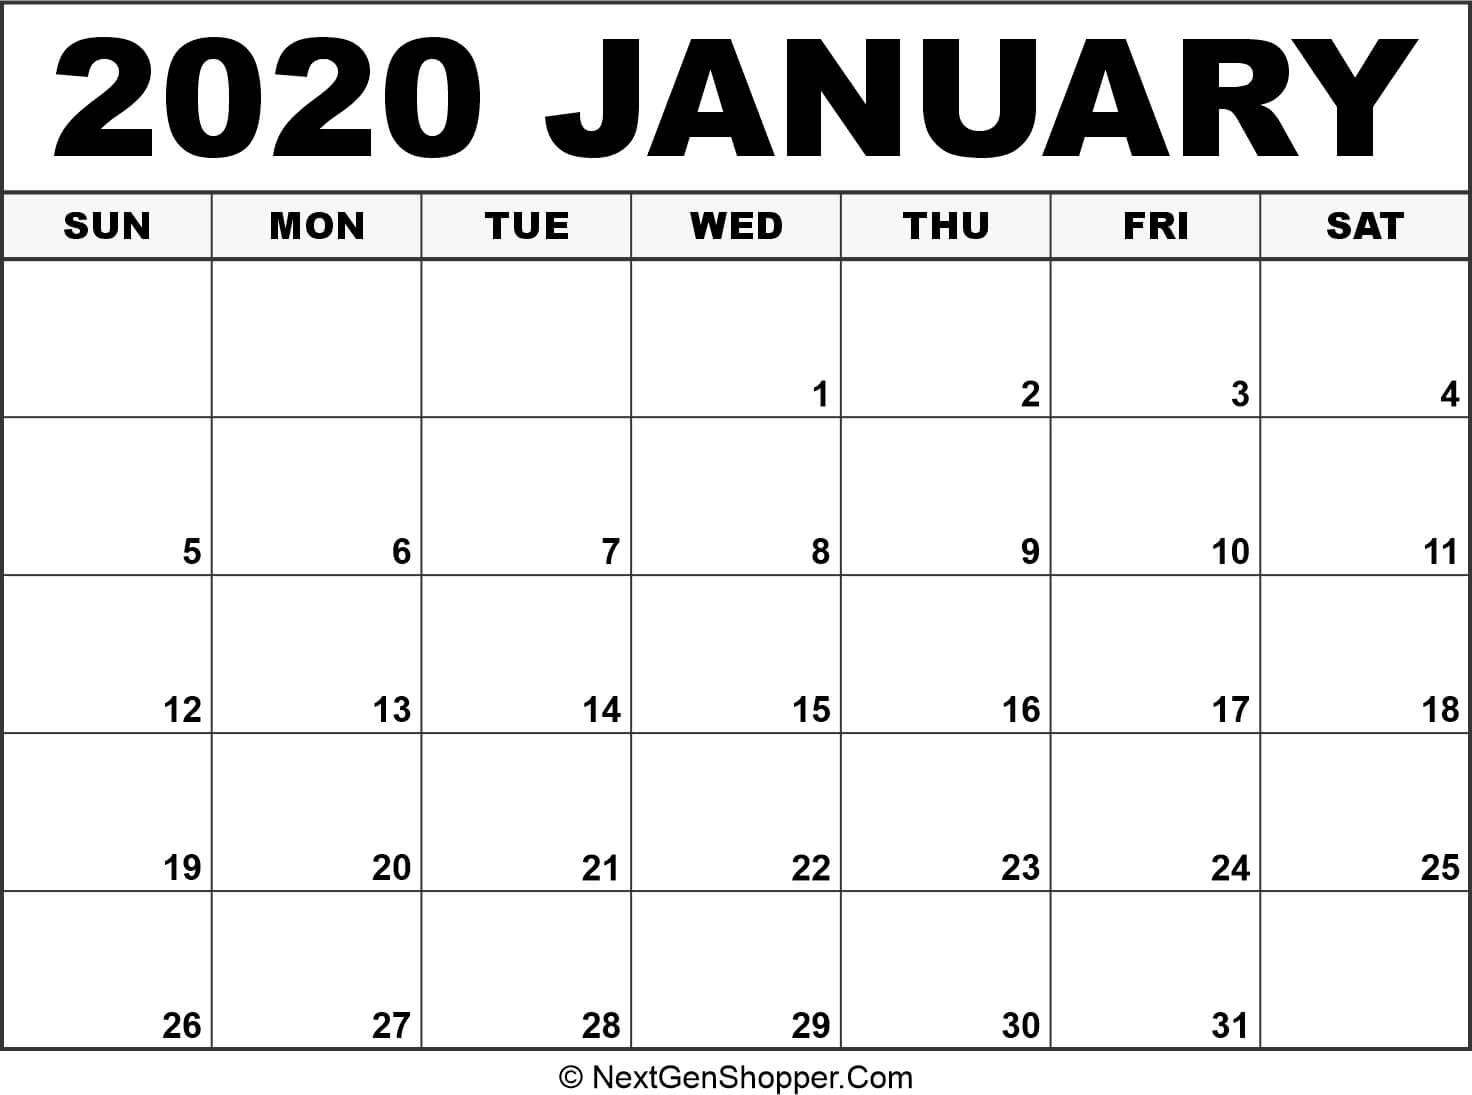 Printable January 2020 Calendar Template - Task Management